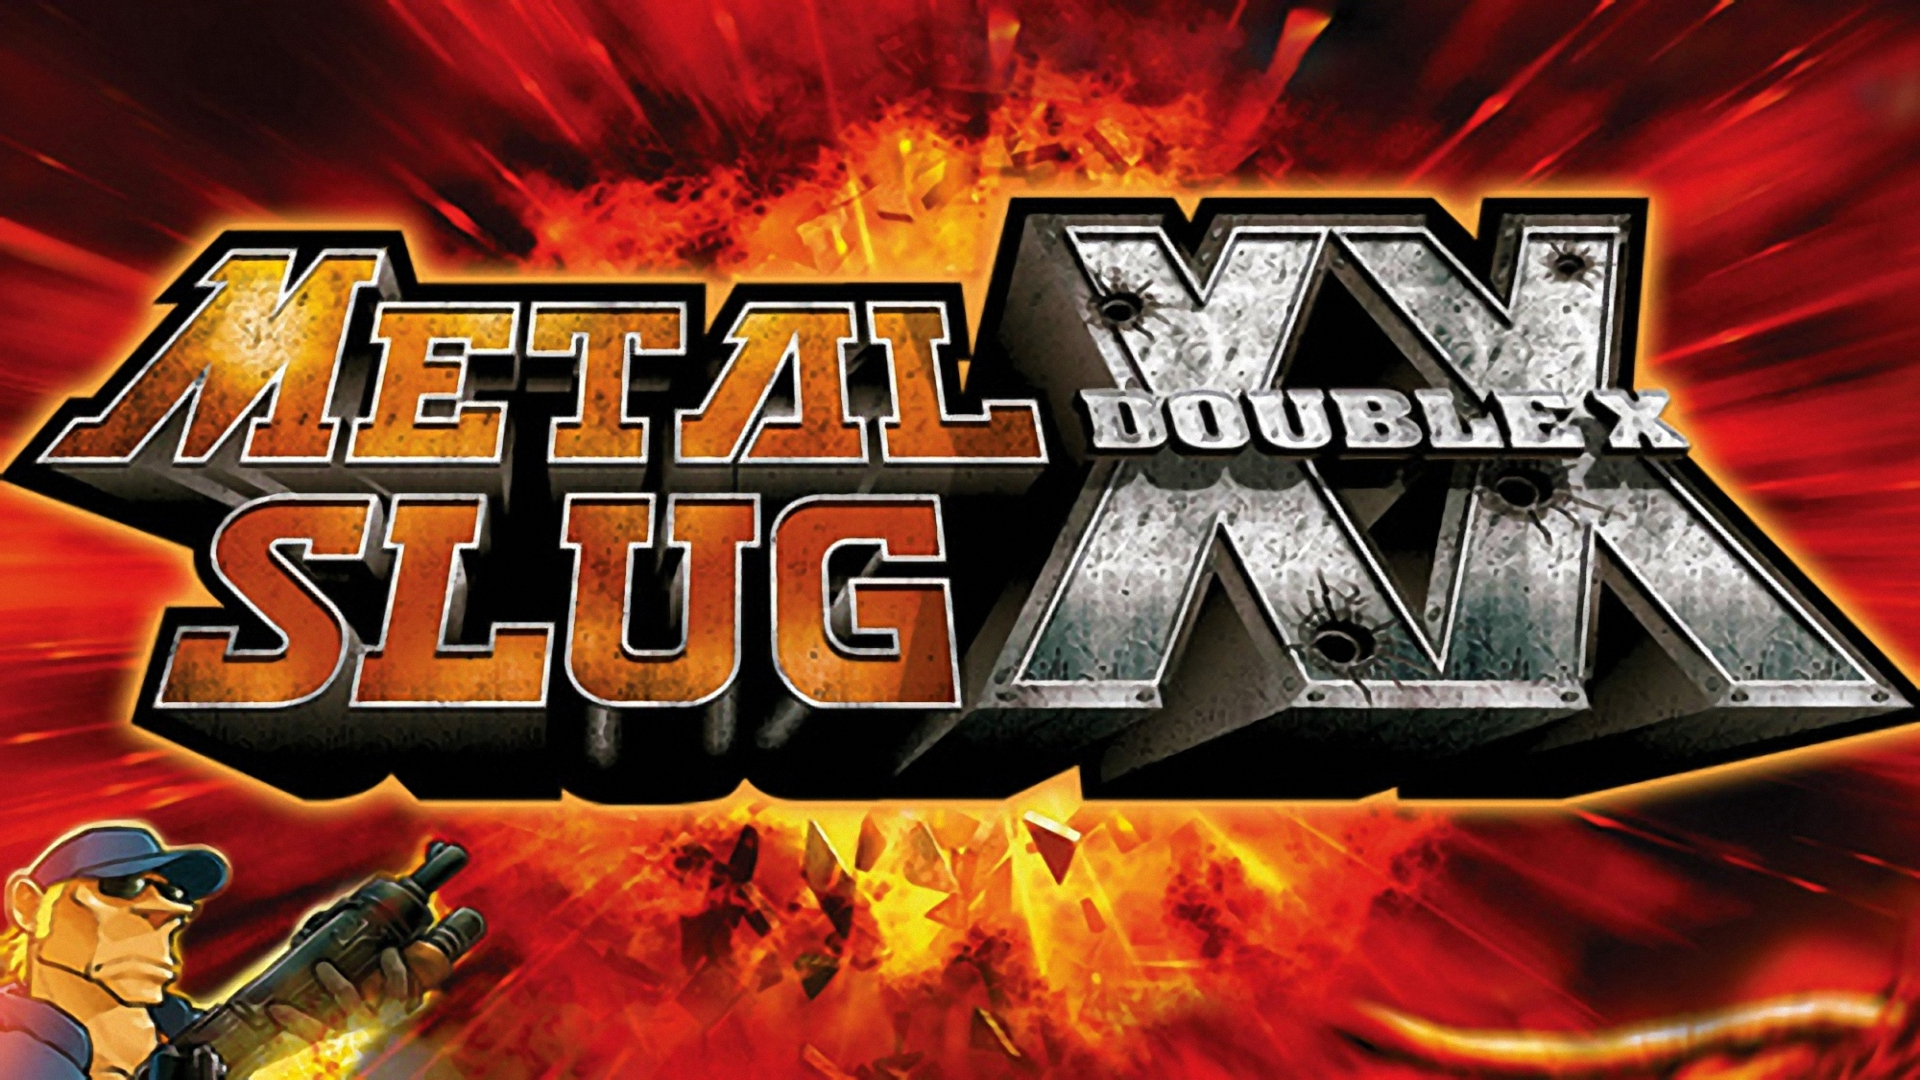 Metal Slug Xx Hd Wallpaper  Background Image  1920X1080  Id587457 - Wallpaper Abyss-8322